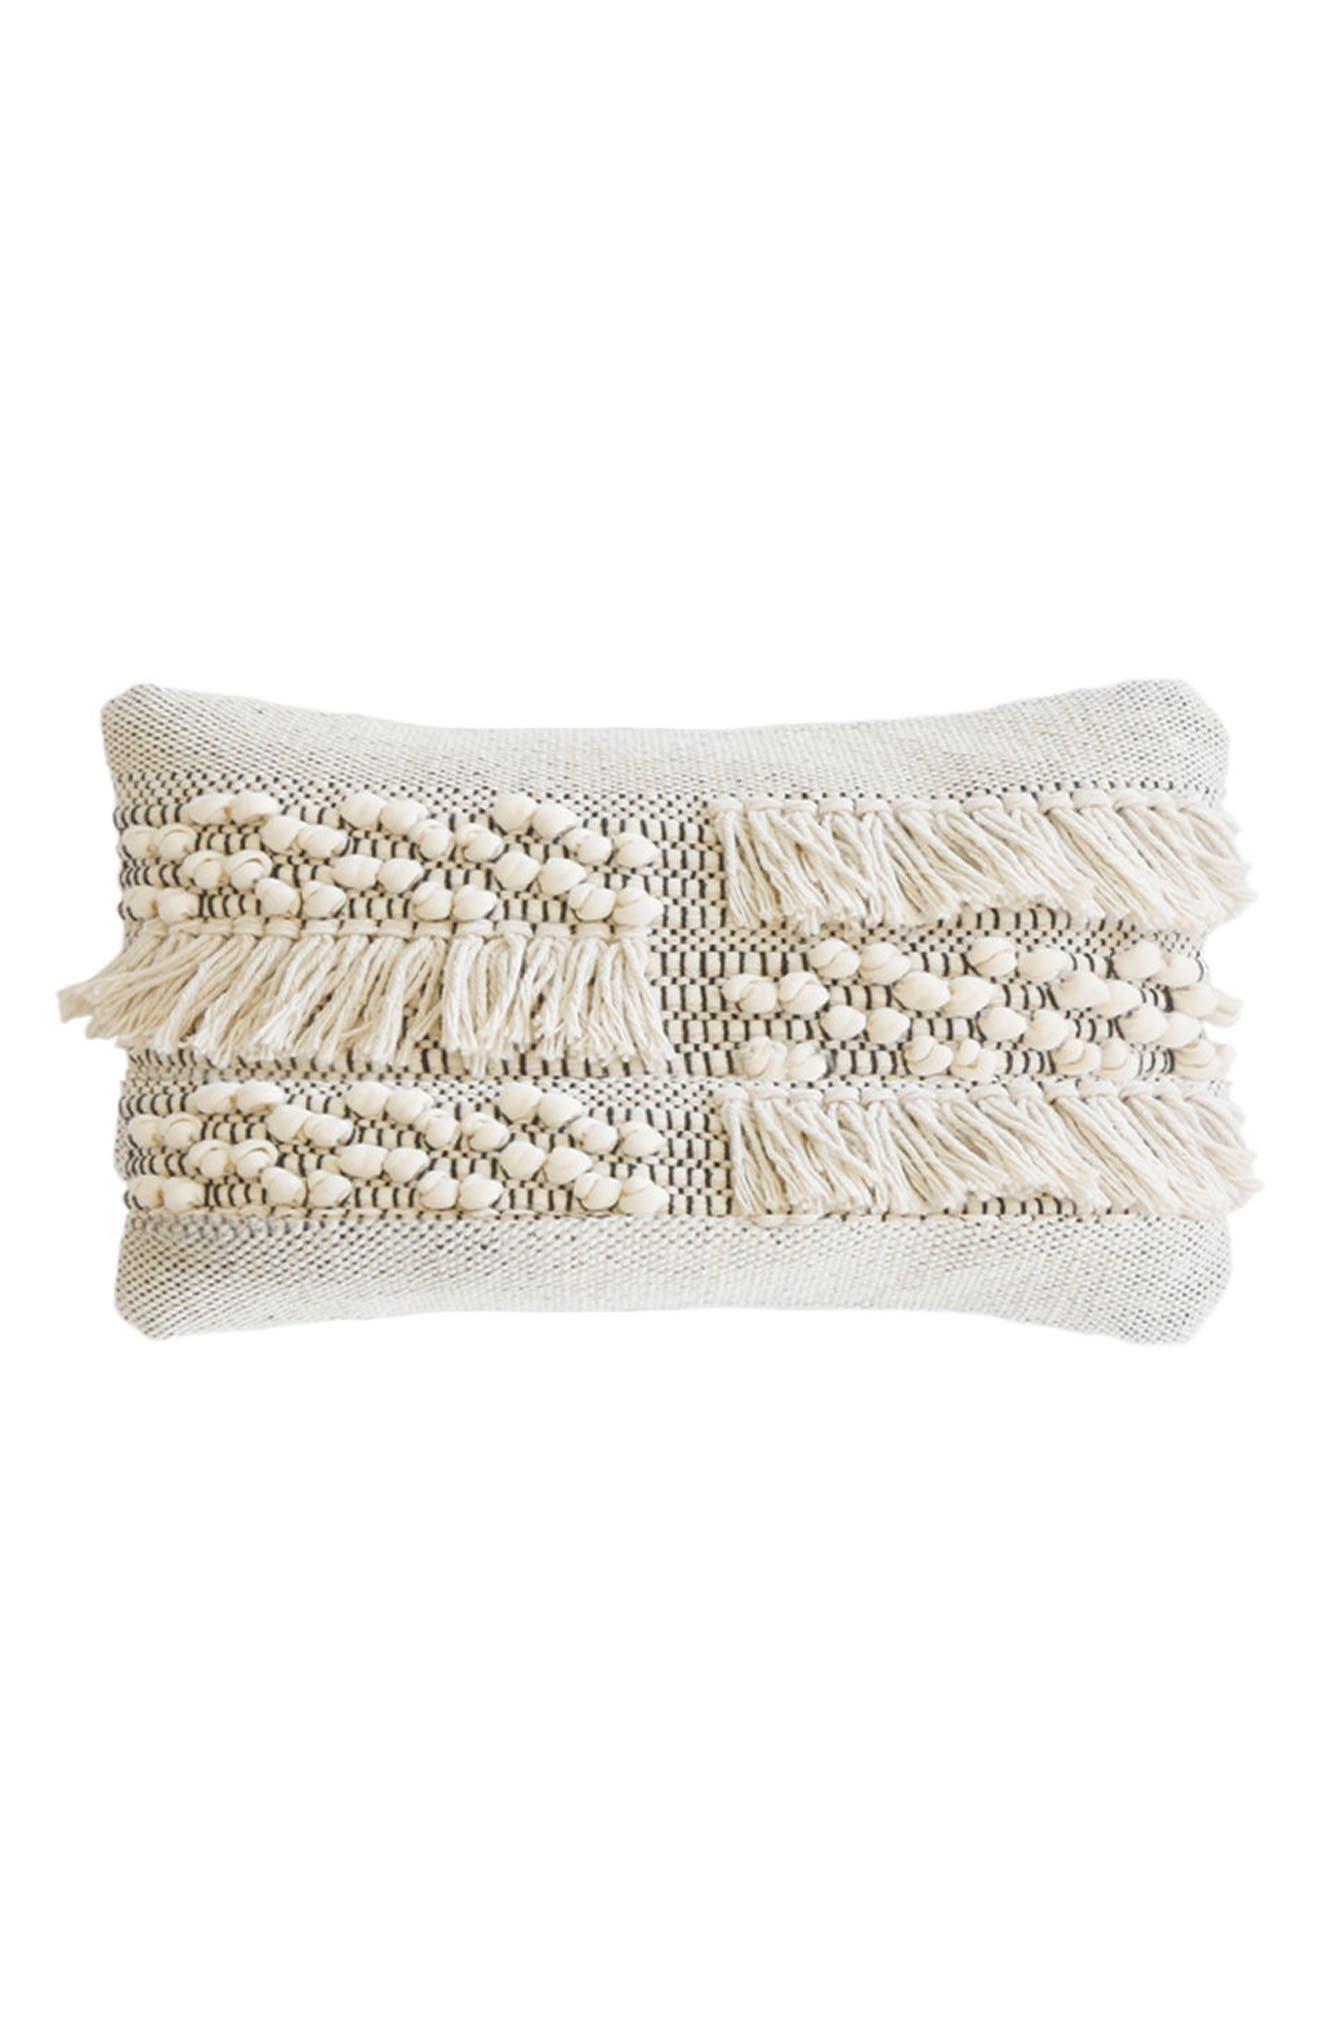 Zahra Accent Pillow,                             Main thumbnail 1, color,                             Ivory